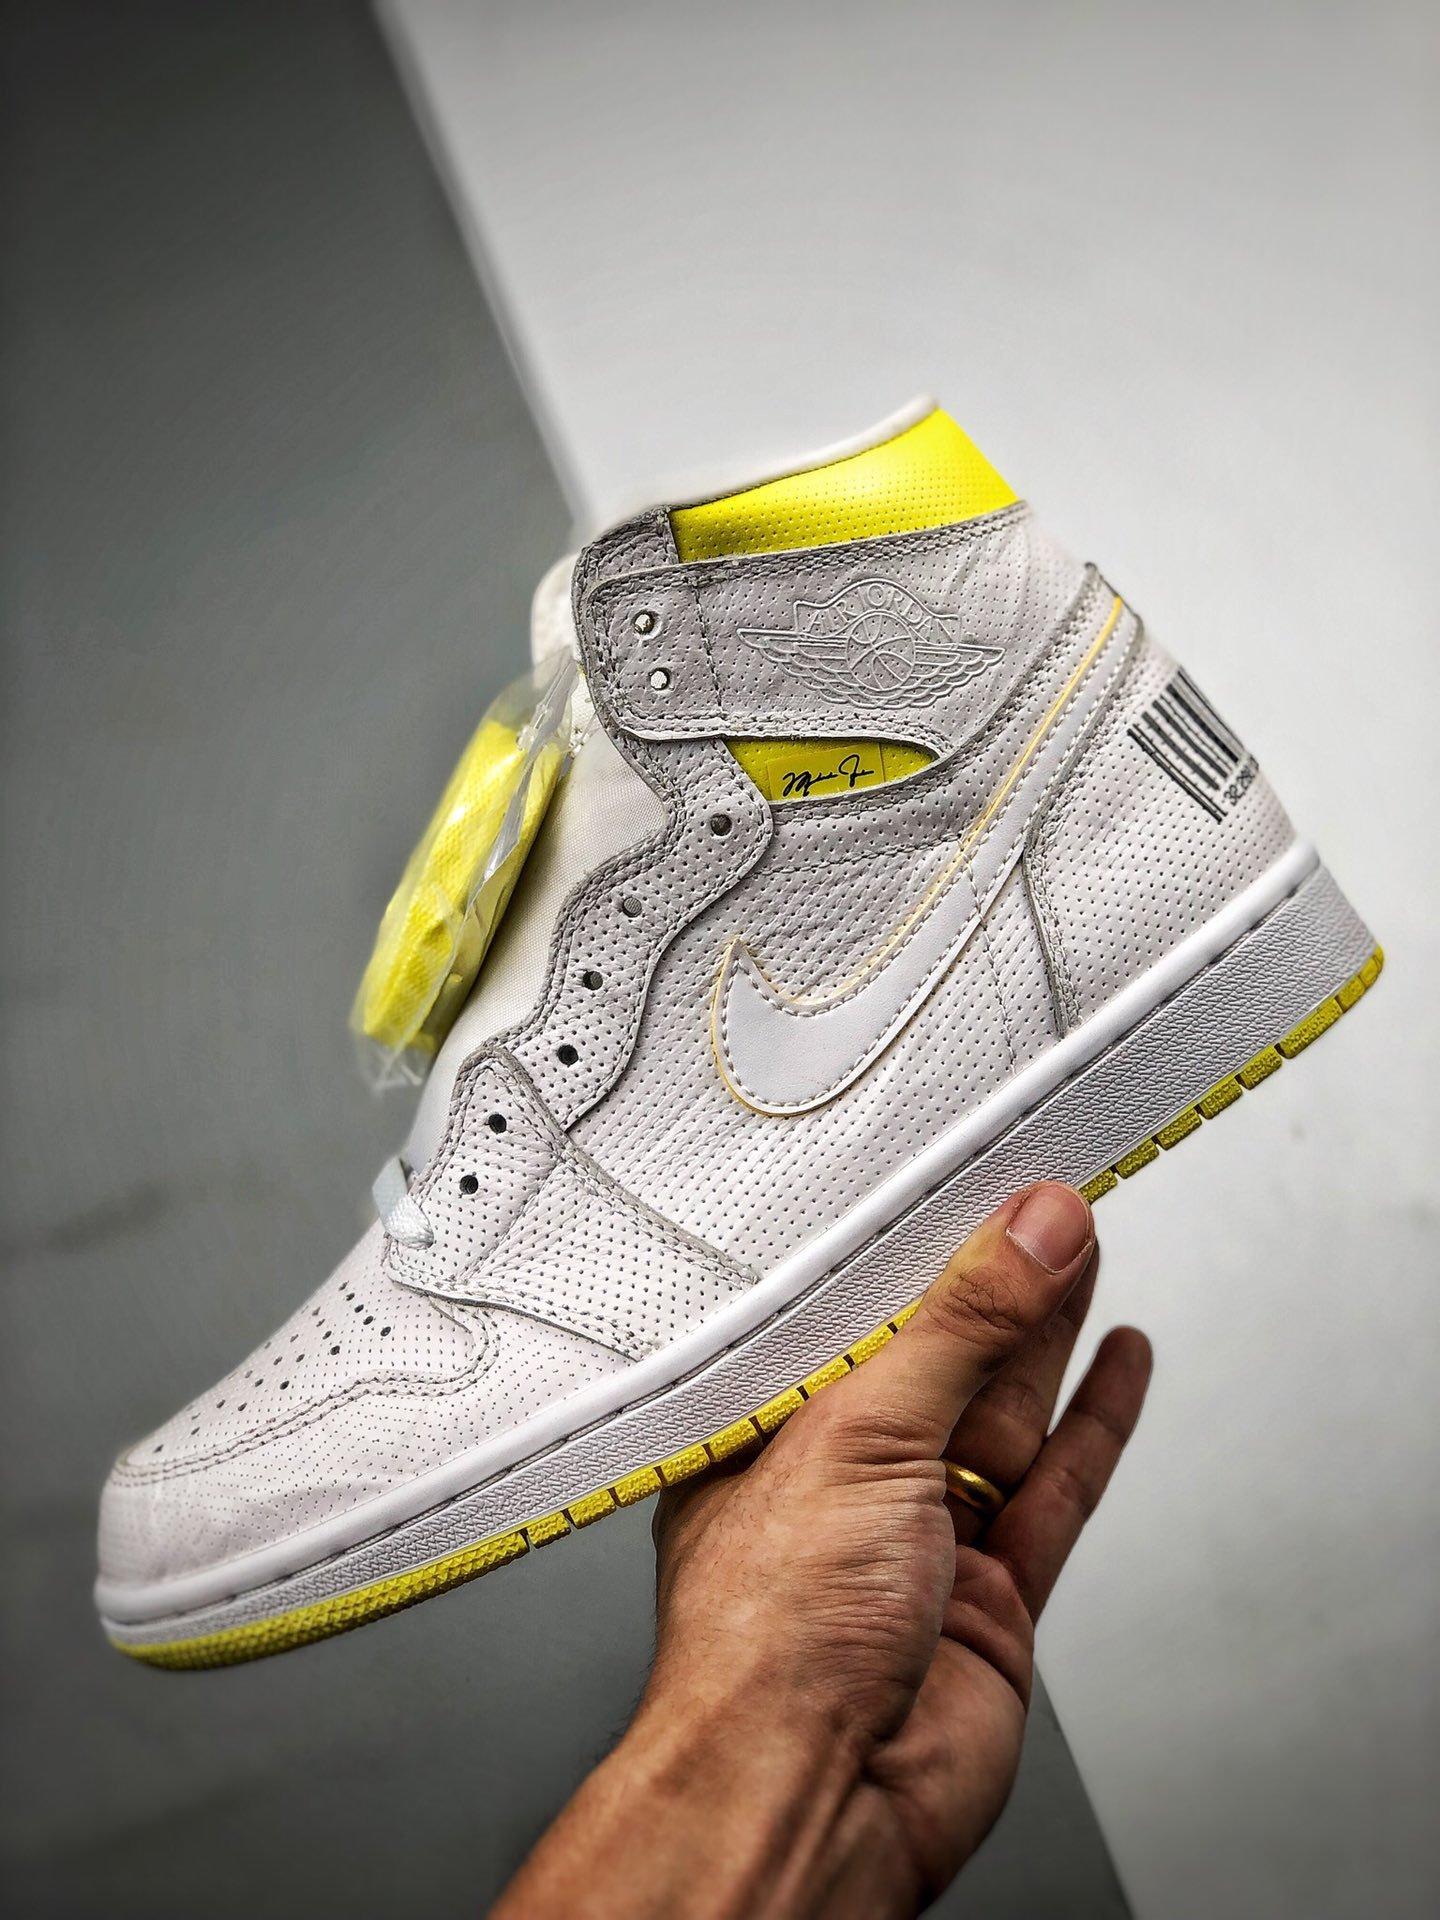 S2纯原高帮 Air Jordan 1 Retro 'First Class Flight' 条形码 - 头等舱 555088-170_s2版本的鞋怎么样